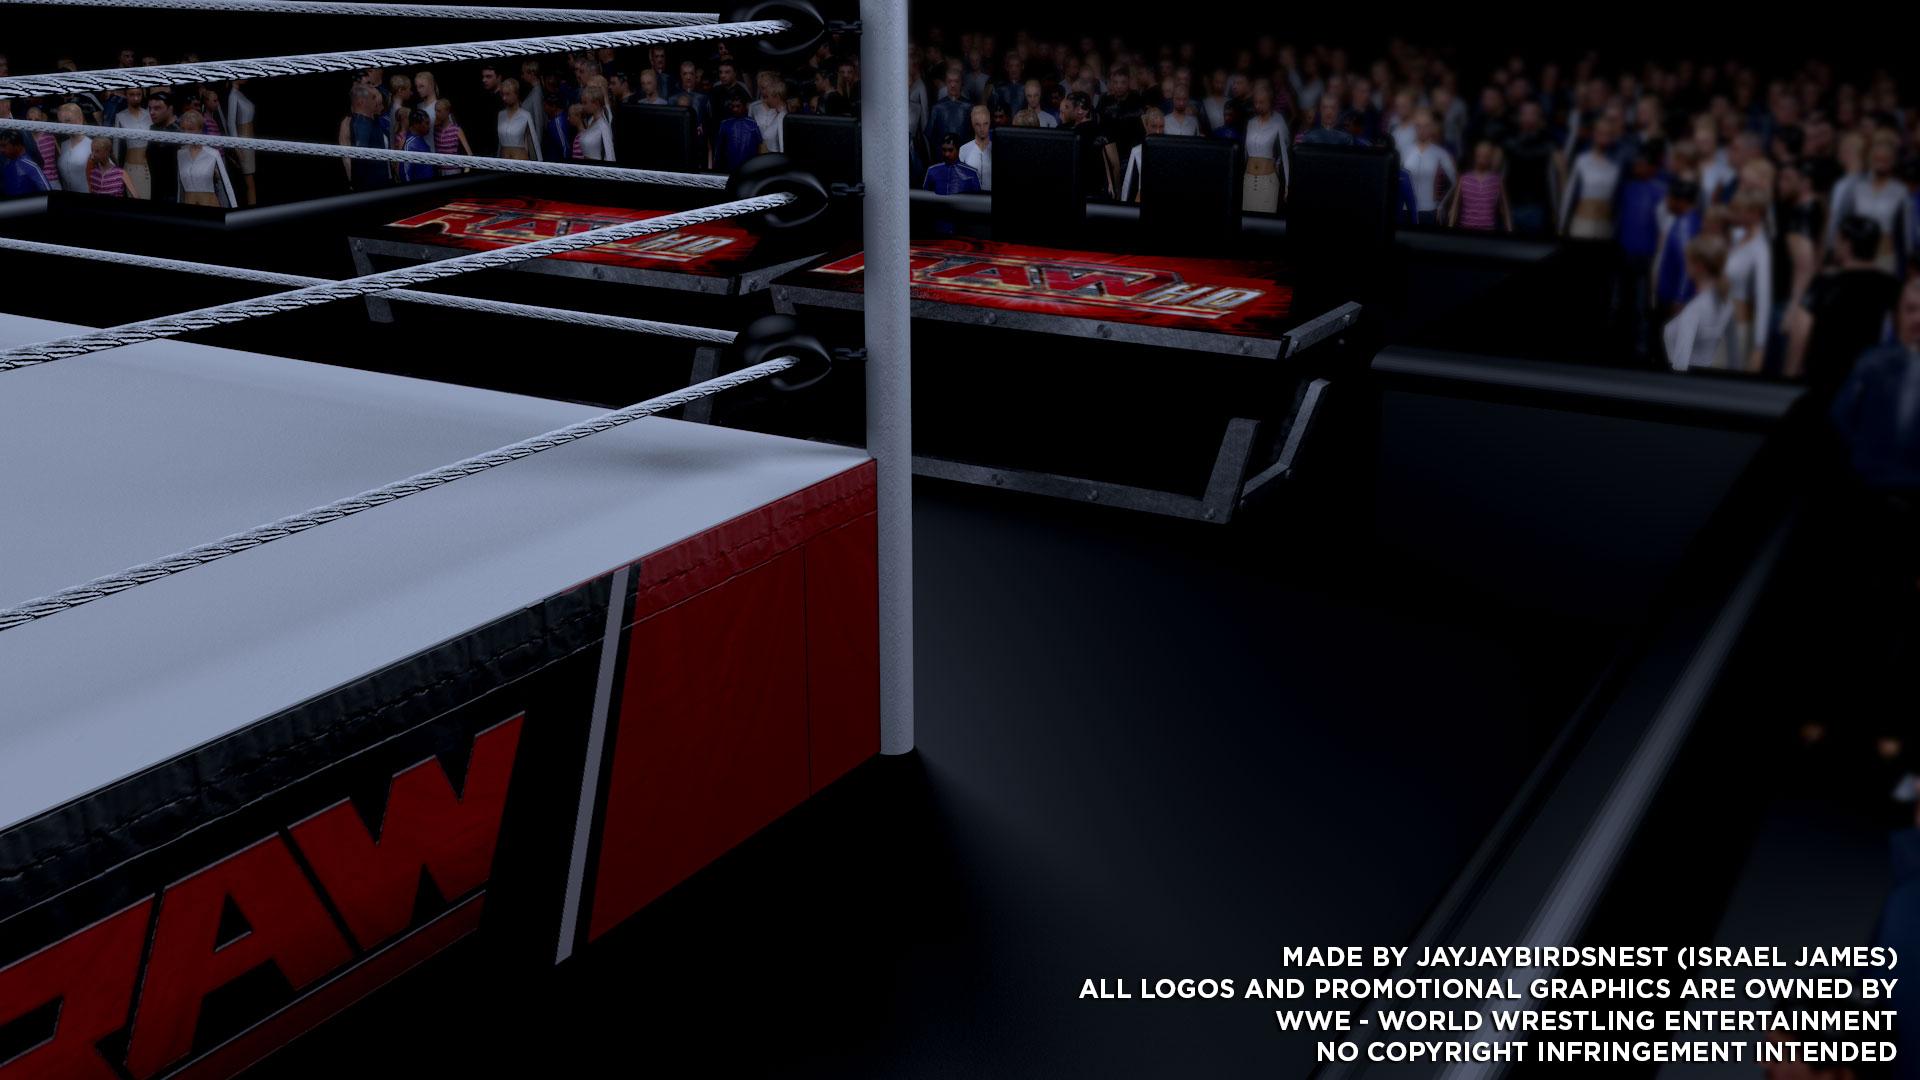 Wwe wrestling ring background